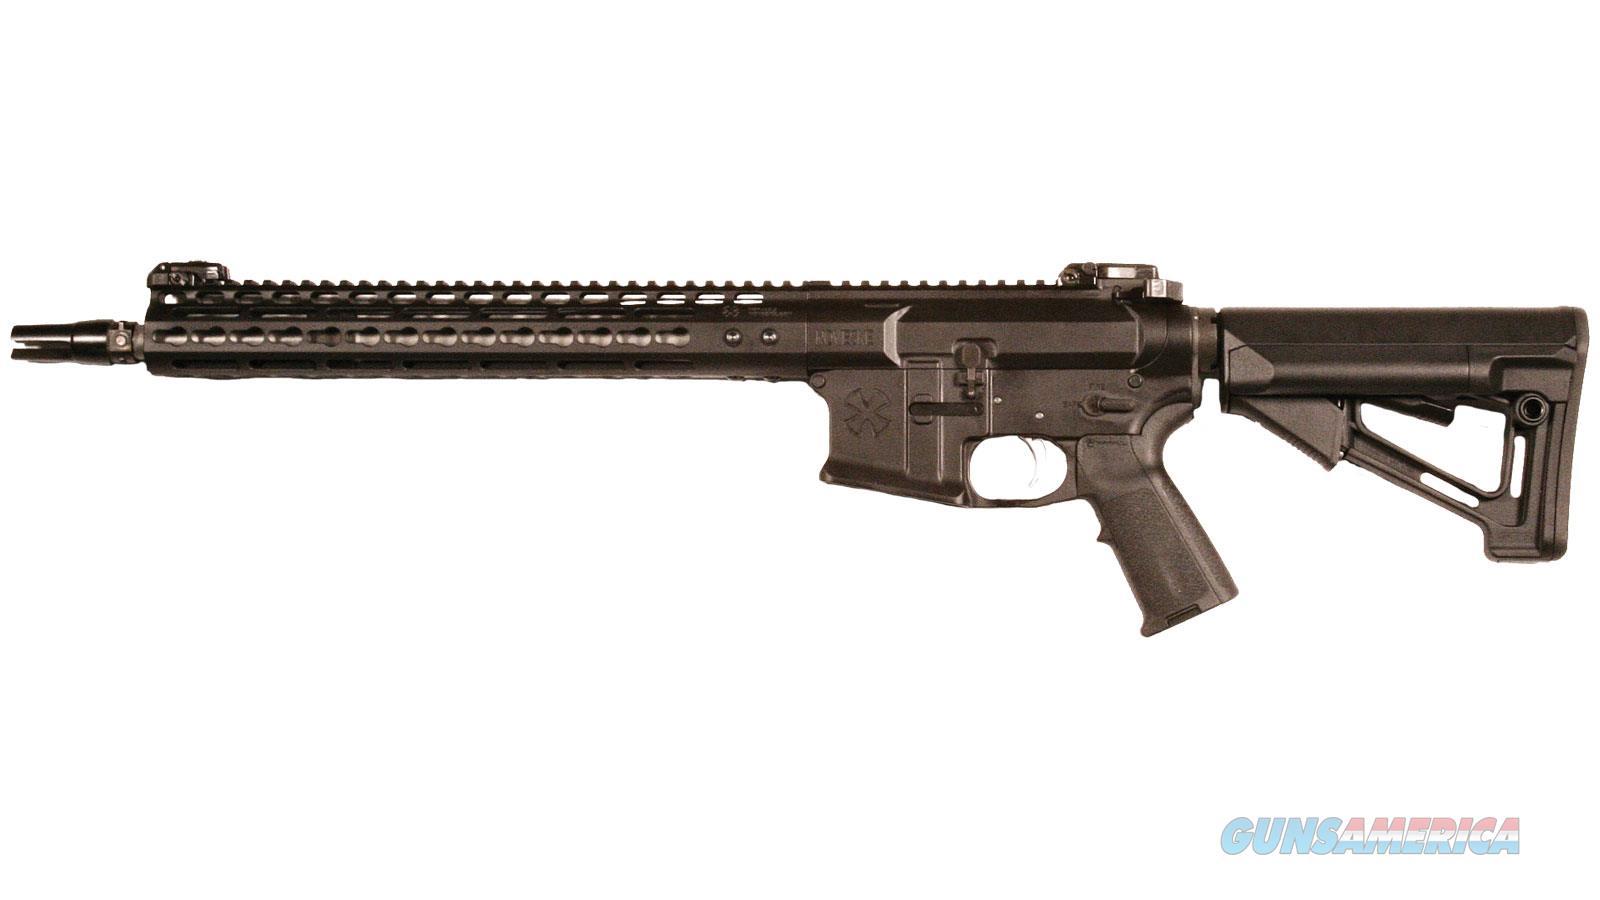 "Noveske Rifleworks Llc Afghan Keymod 5.56 14.5"" 02000303  Guns > Rifles > MN Misc Rifles"